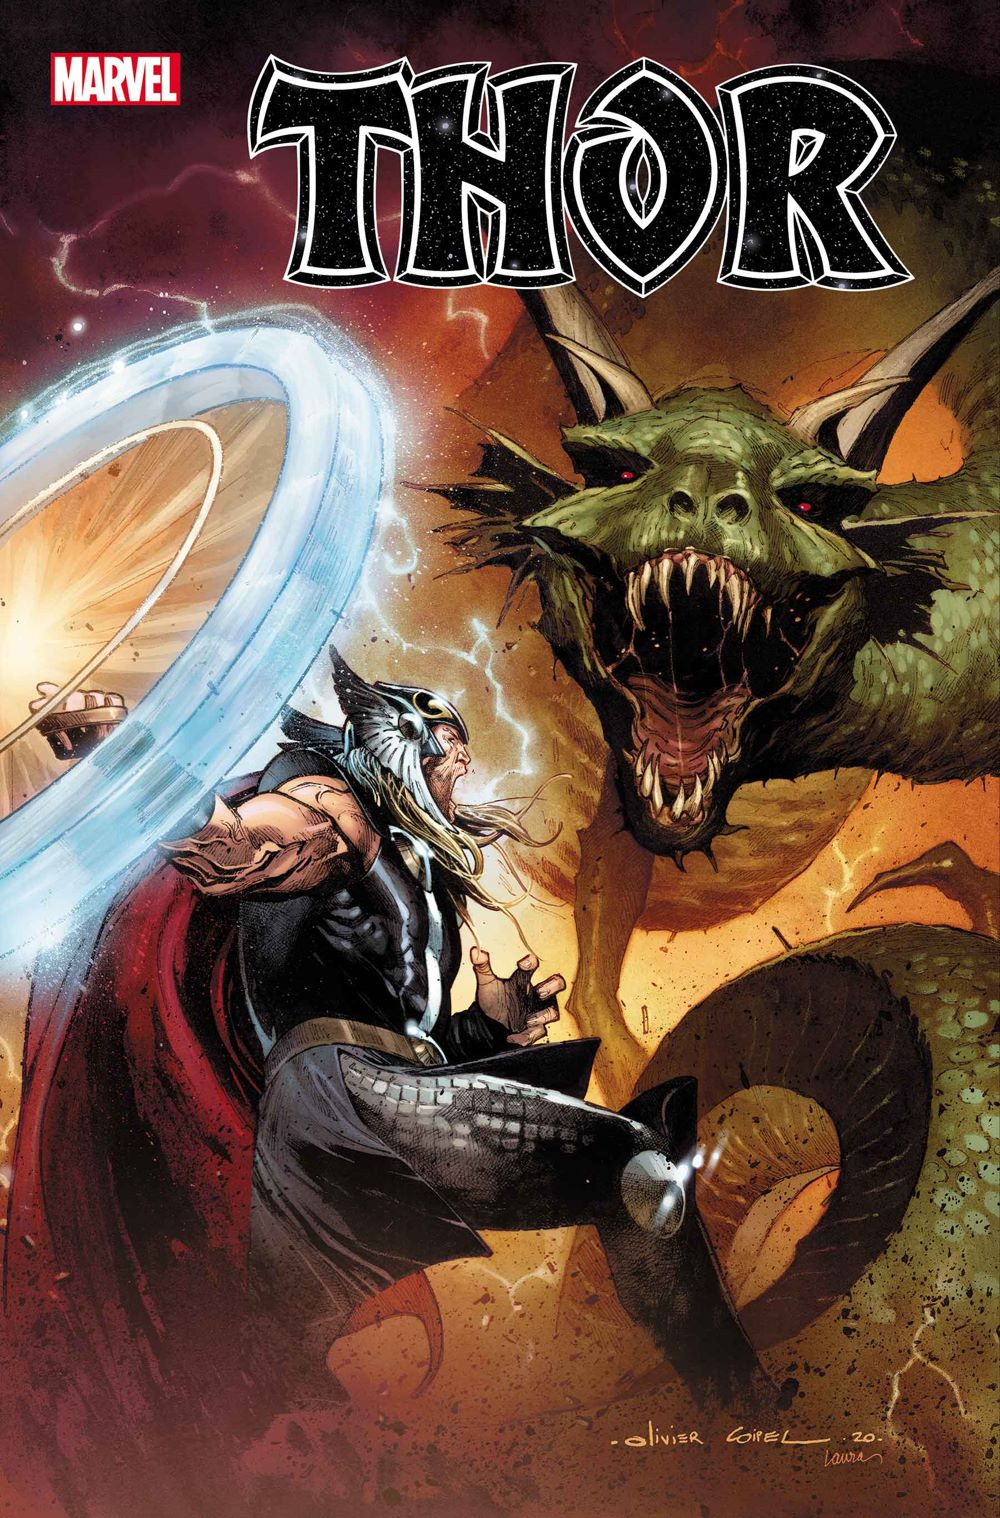 THOR2020011_cvr Marvel Comics January 2021 Solicitations